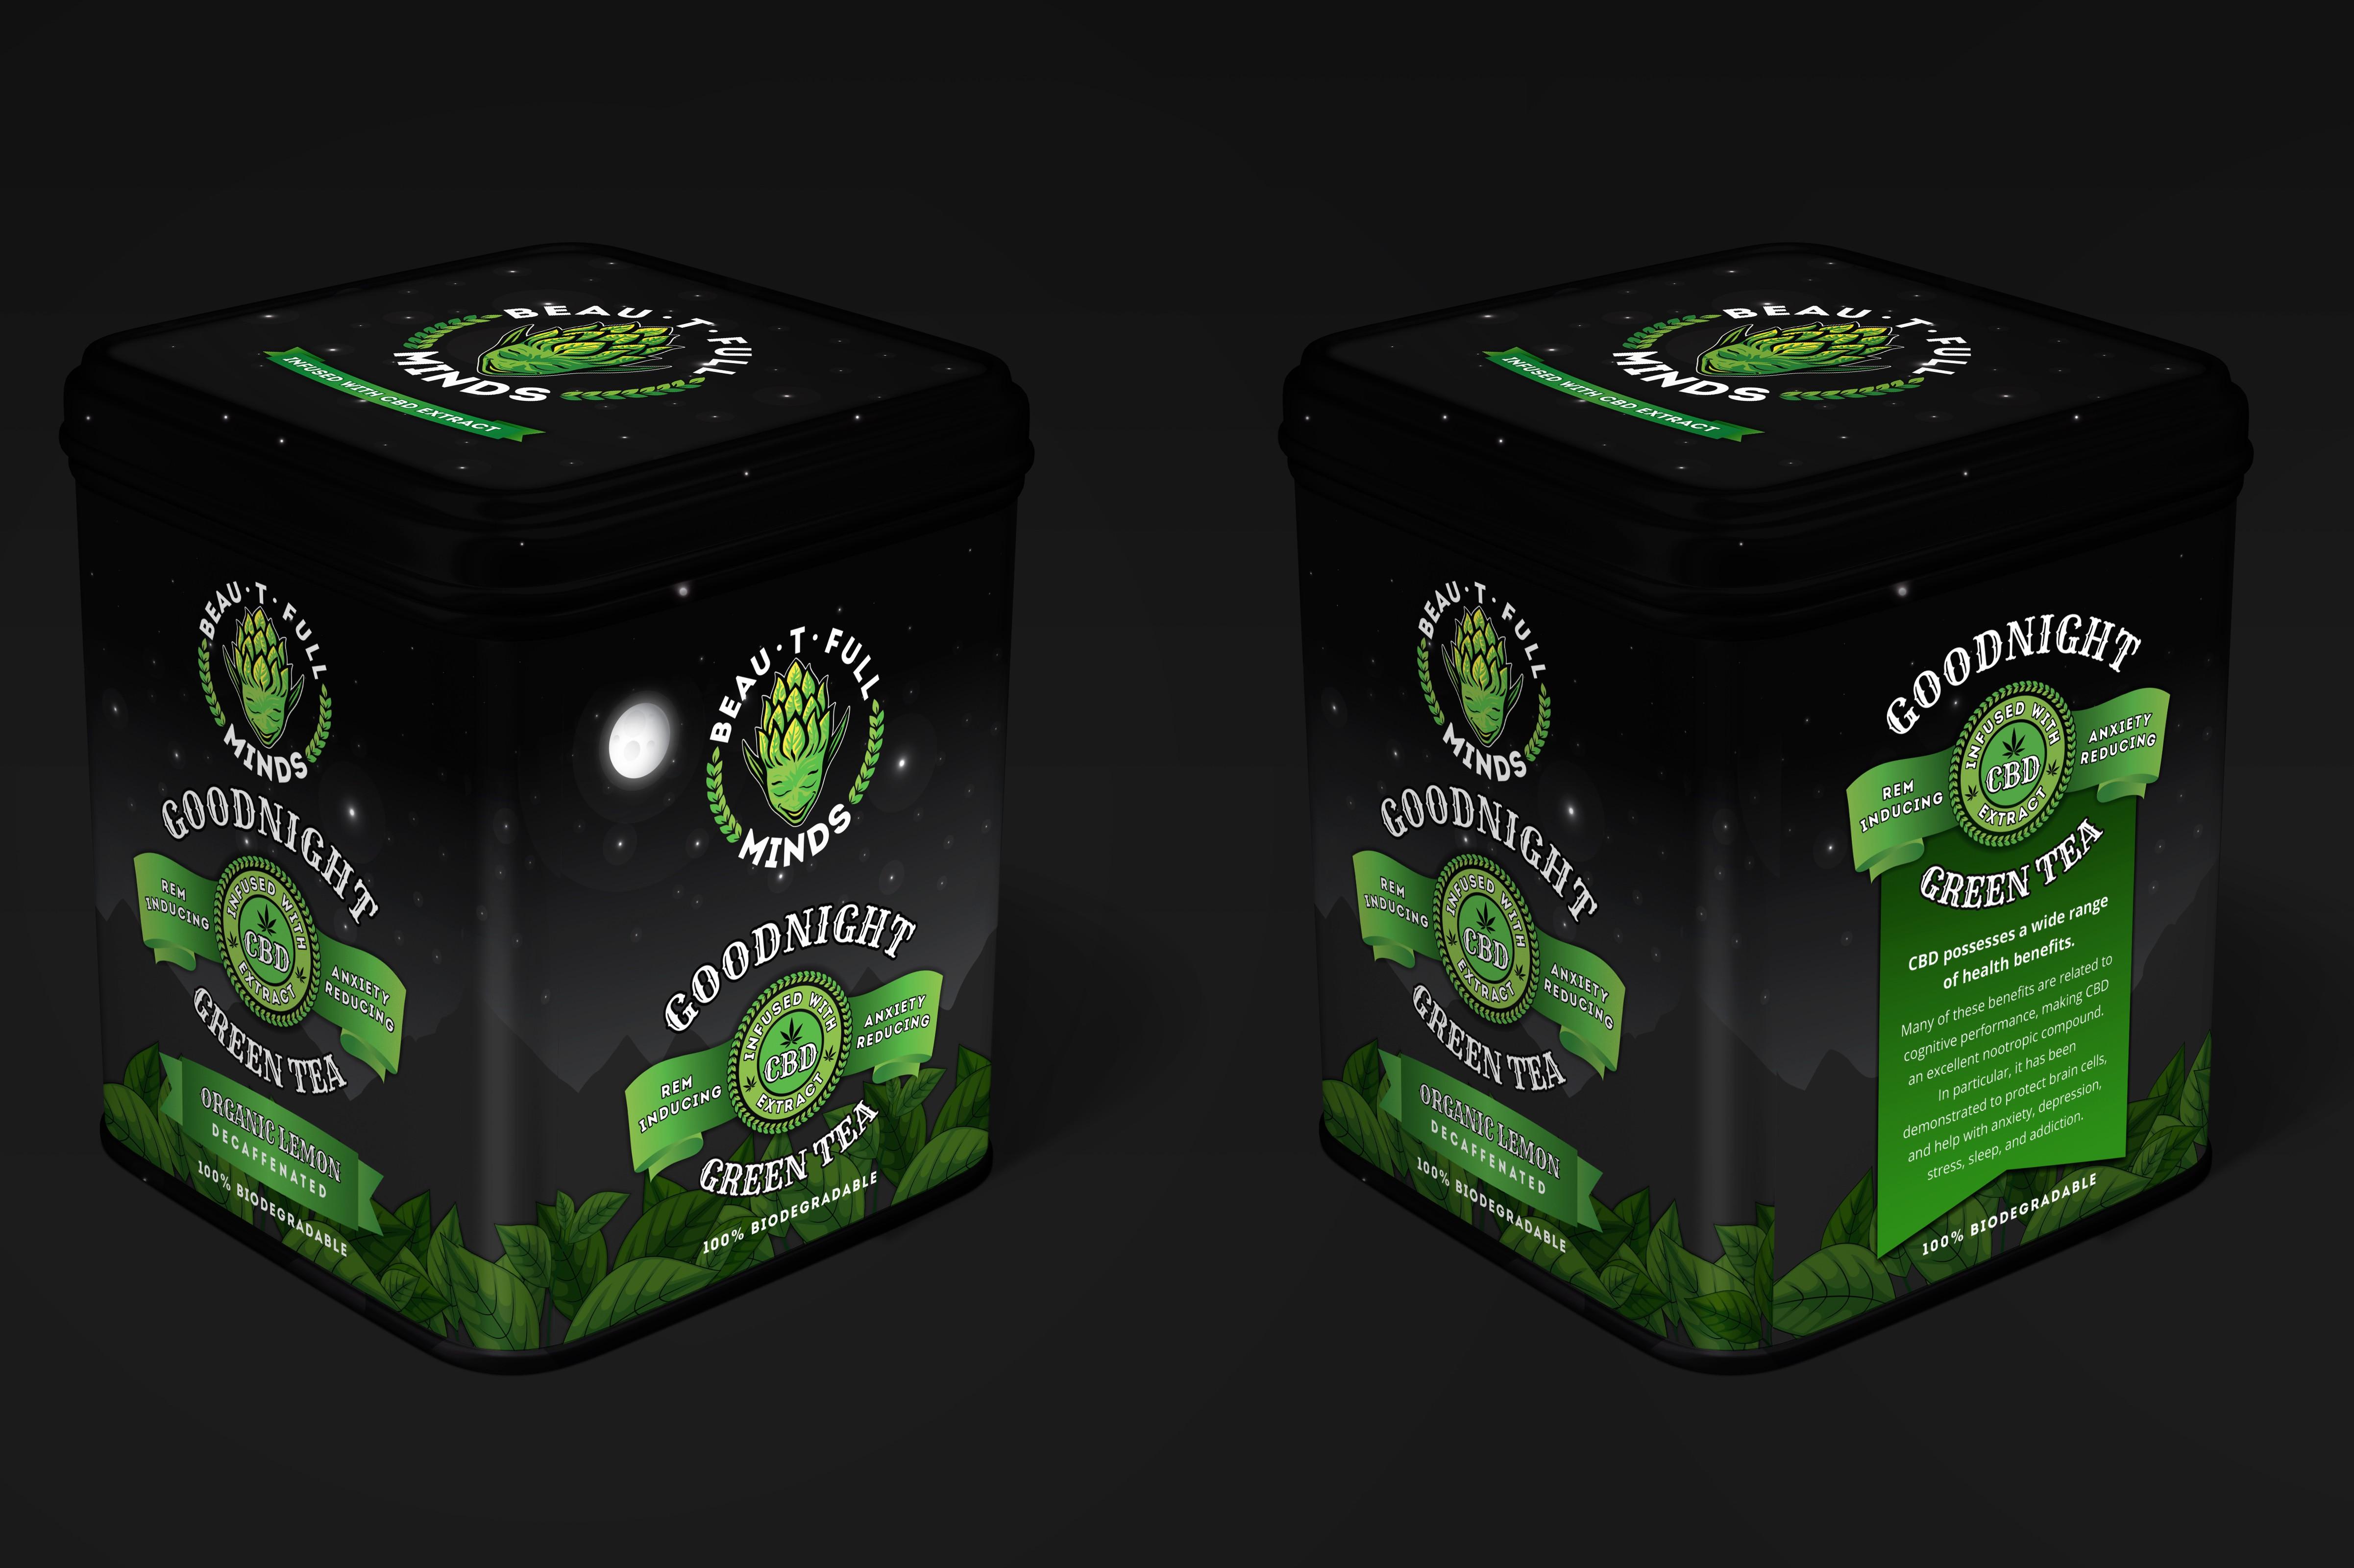 BEAU-T-FULL GREEN TEA PACKAGING